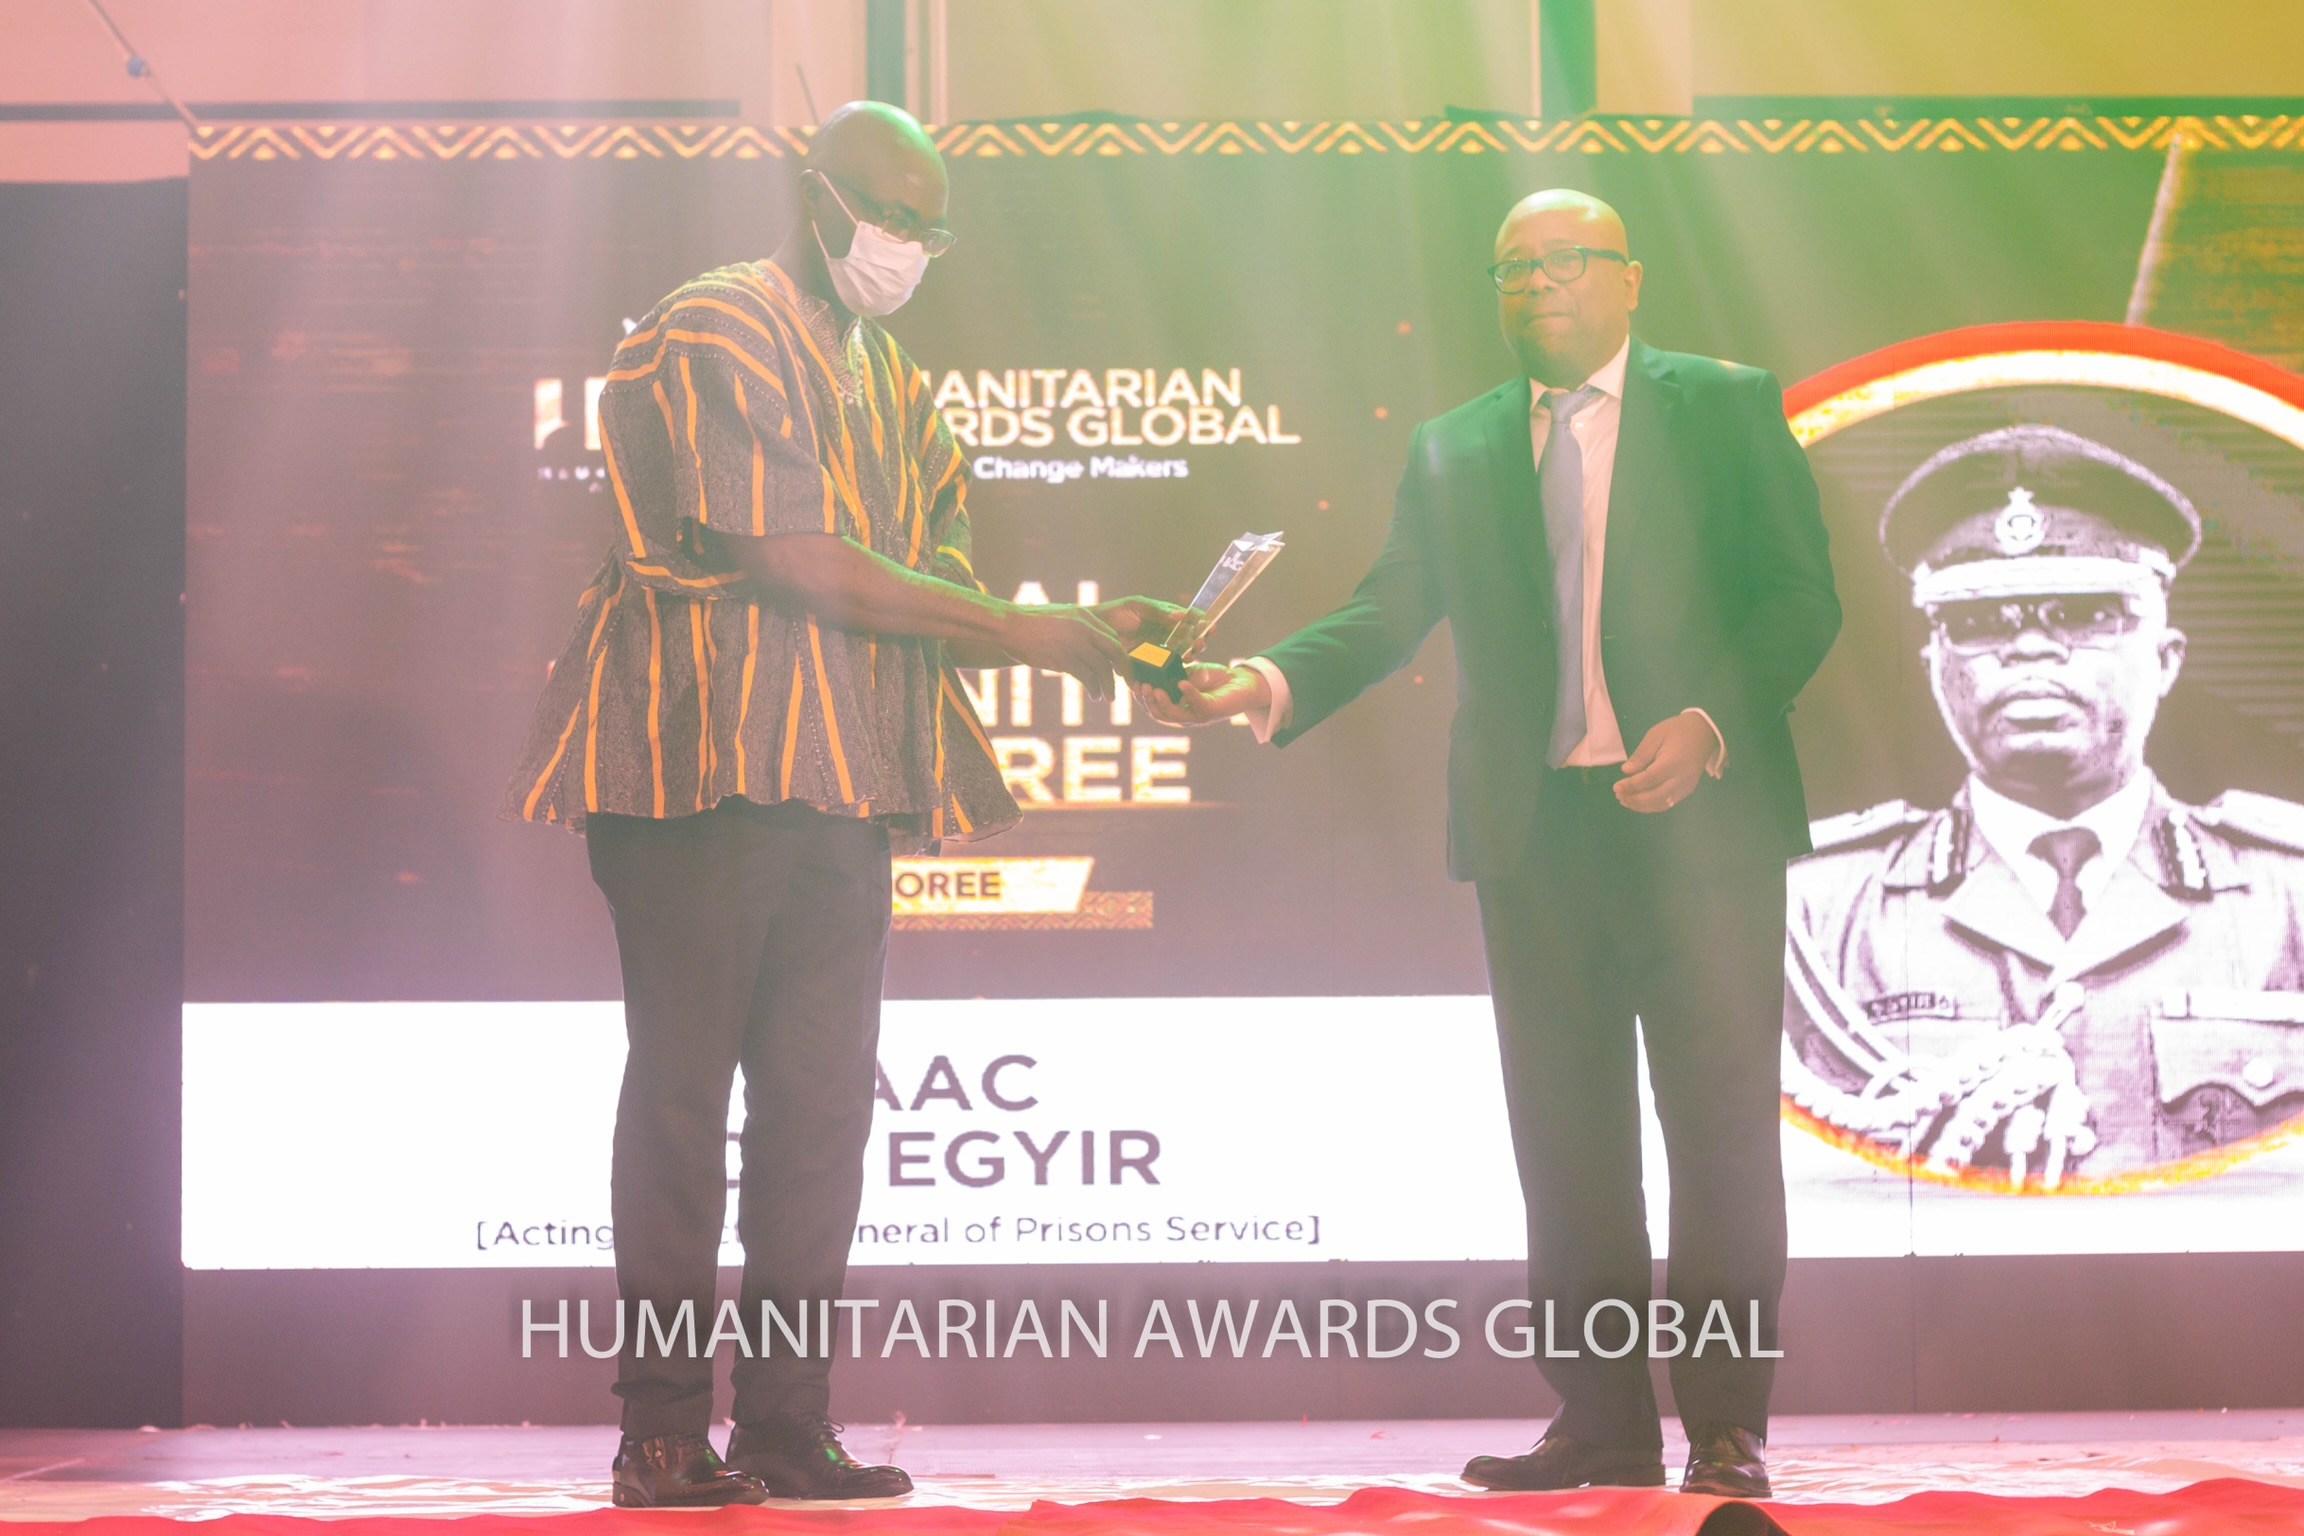 AG Director of Ghana Prison Service, Mr Isaac Kofi Agyir honoured at this year's Humanitarian Awards Global.